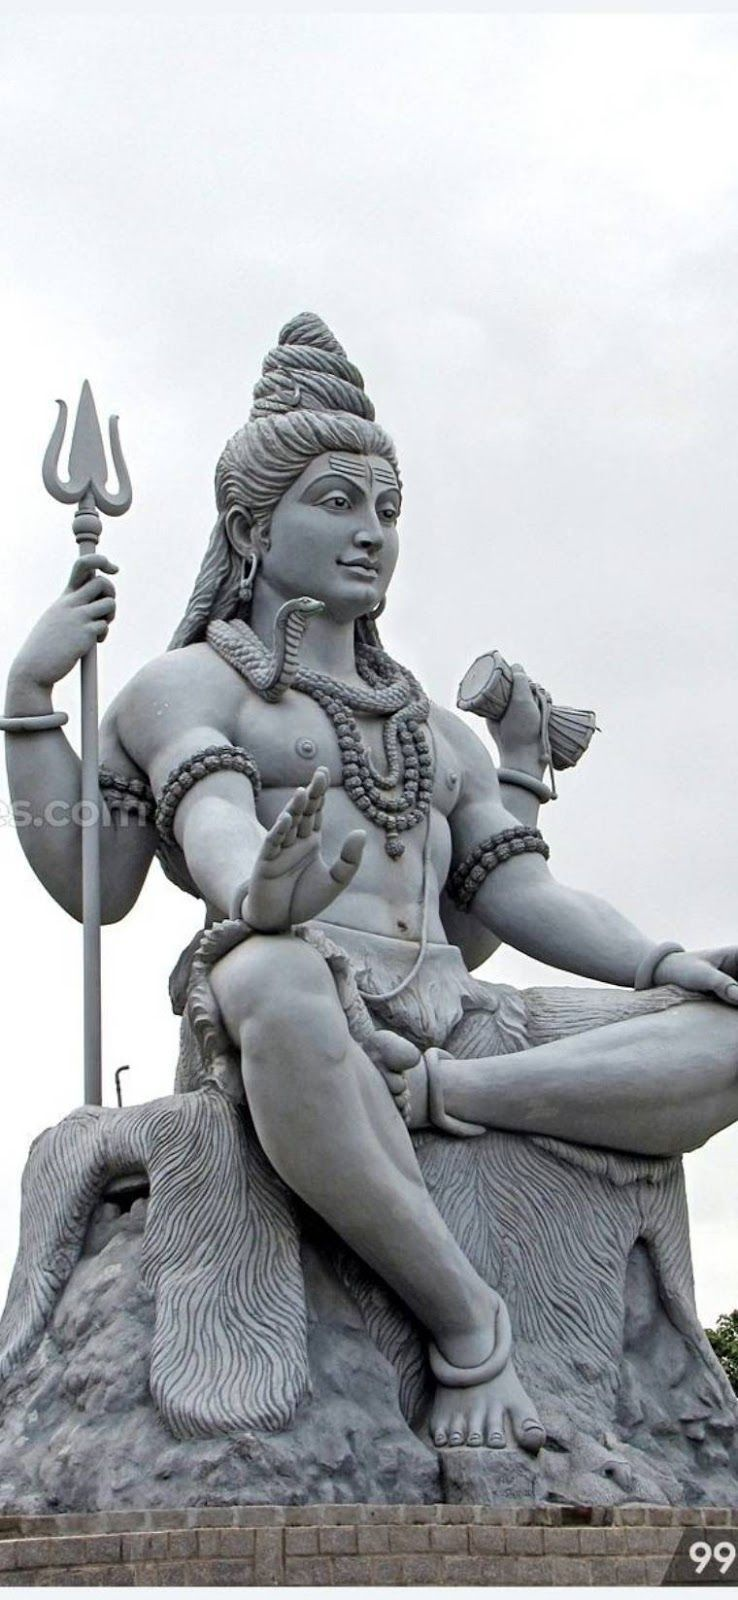 Most Unique And Ultra Hd Shiva Wallpapers Hindu God Mahadev Full Hd Wallpaper For Mobile Mahadev Hd Wallpaper Lord Shiva Hd Images Lord Shiva Hd Wallpaper